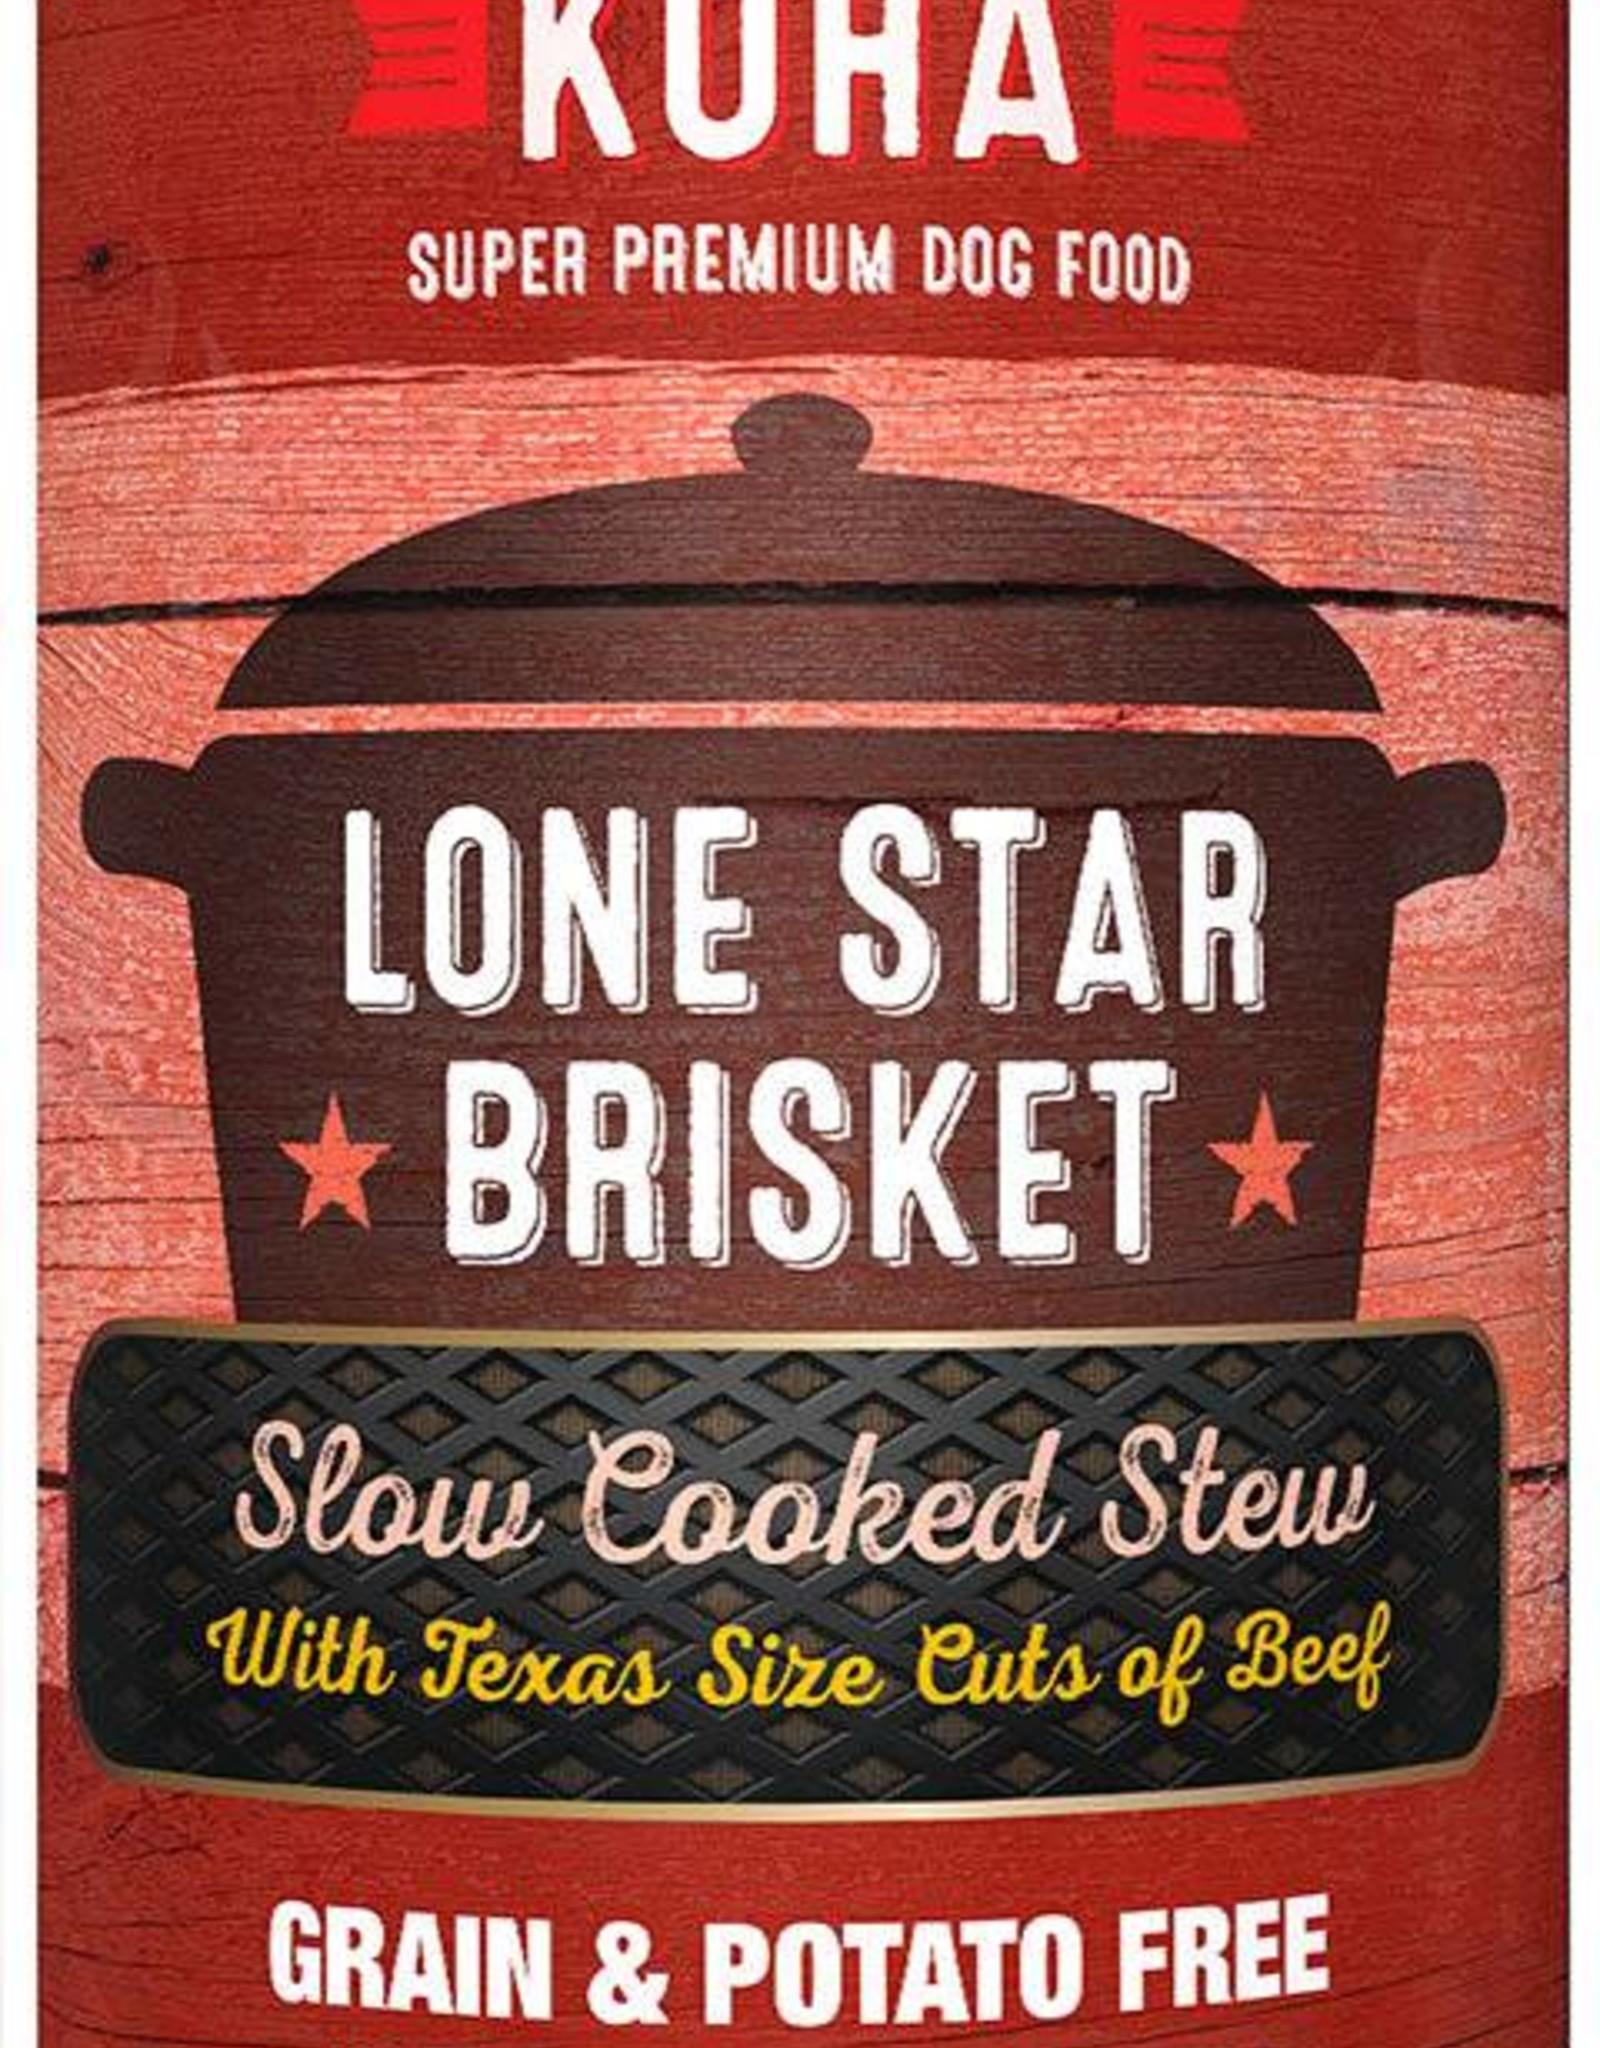 Koha Koha Lone Star Brisket Slow Cooked Stew for Dogs 12.7oz